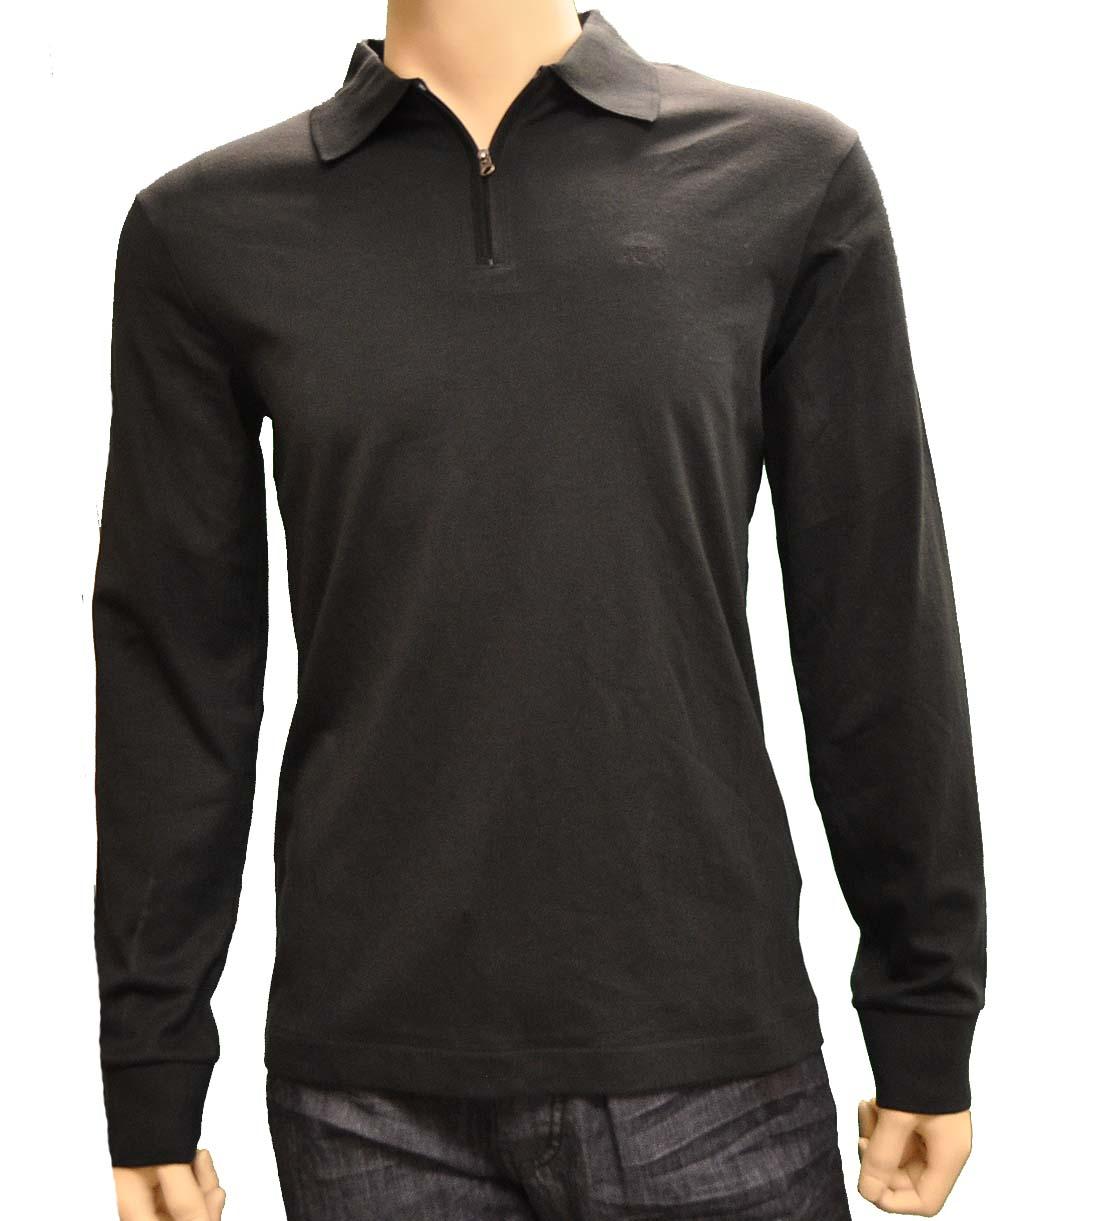 Armani Jeans Black Cotton Shirt